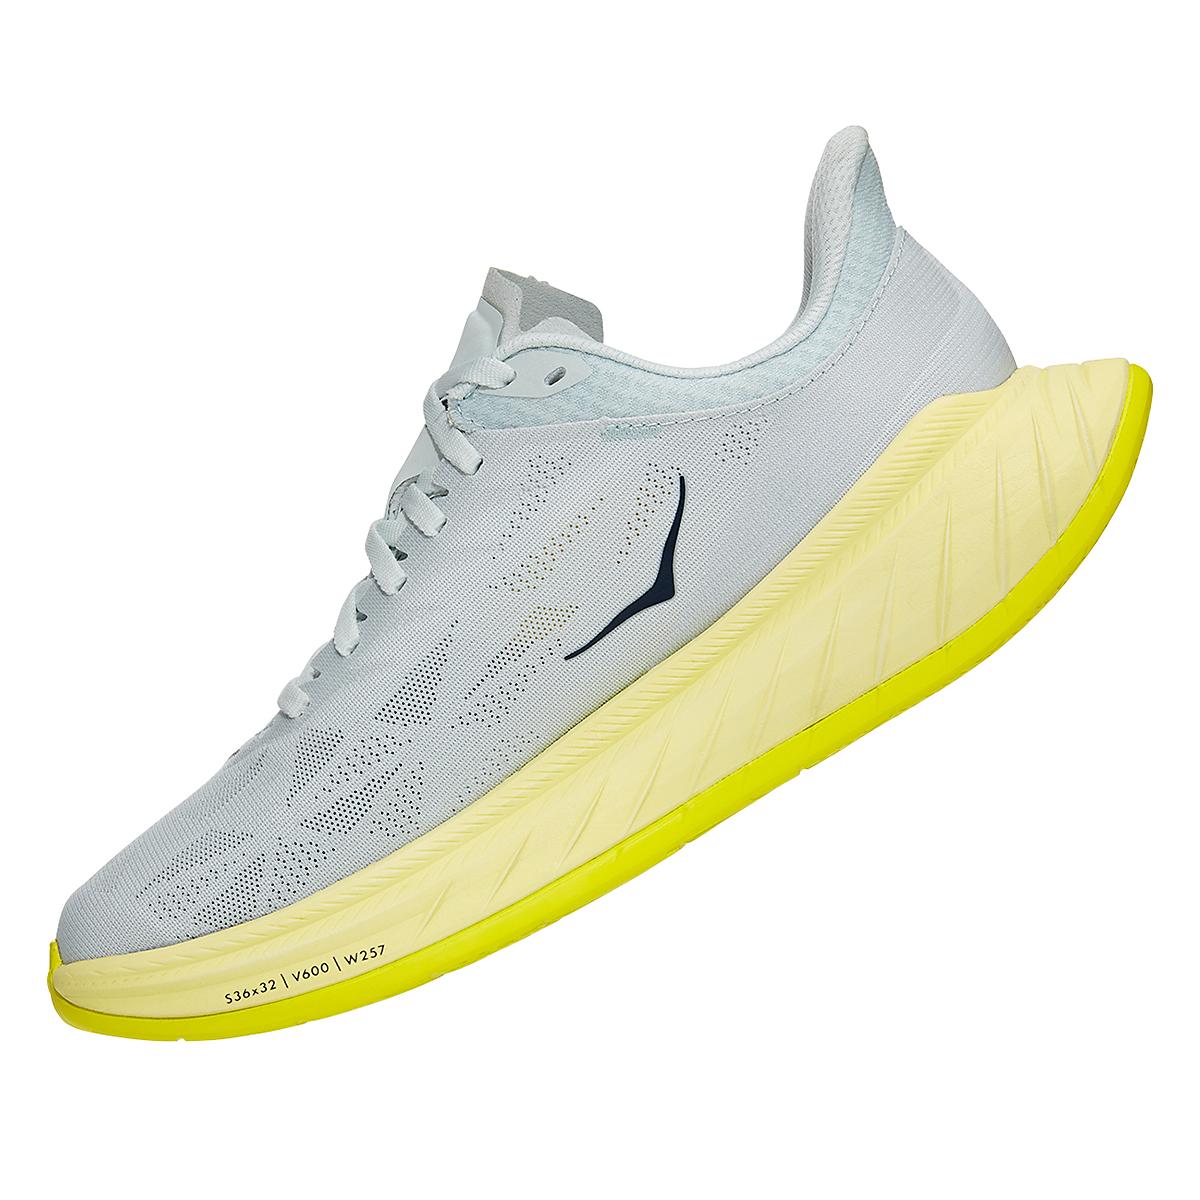 Women's Hoka One One Carbon X 2 Running Shoe - Color: Blue Flower/Luminary Green - Size: 5 - Width: Regular, Blue Flower/Luminary Green, large, image 4